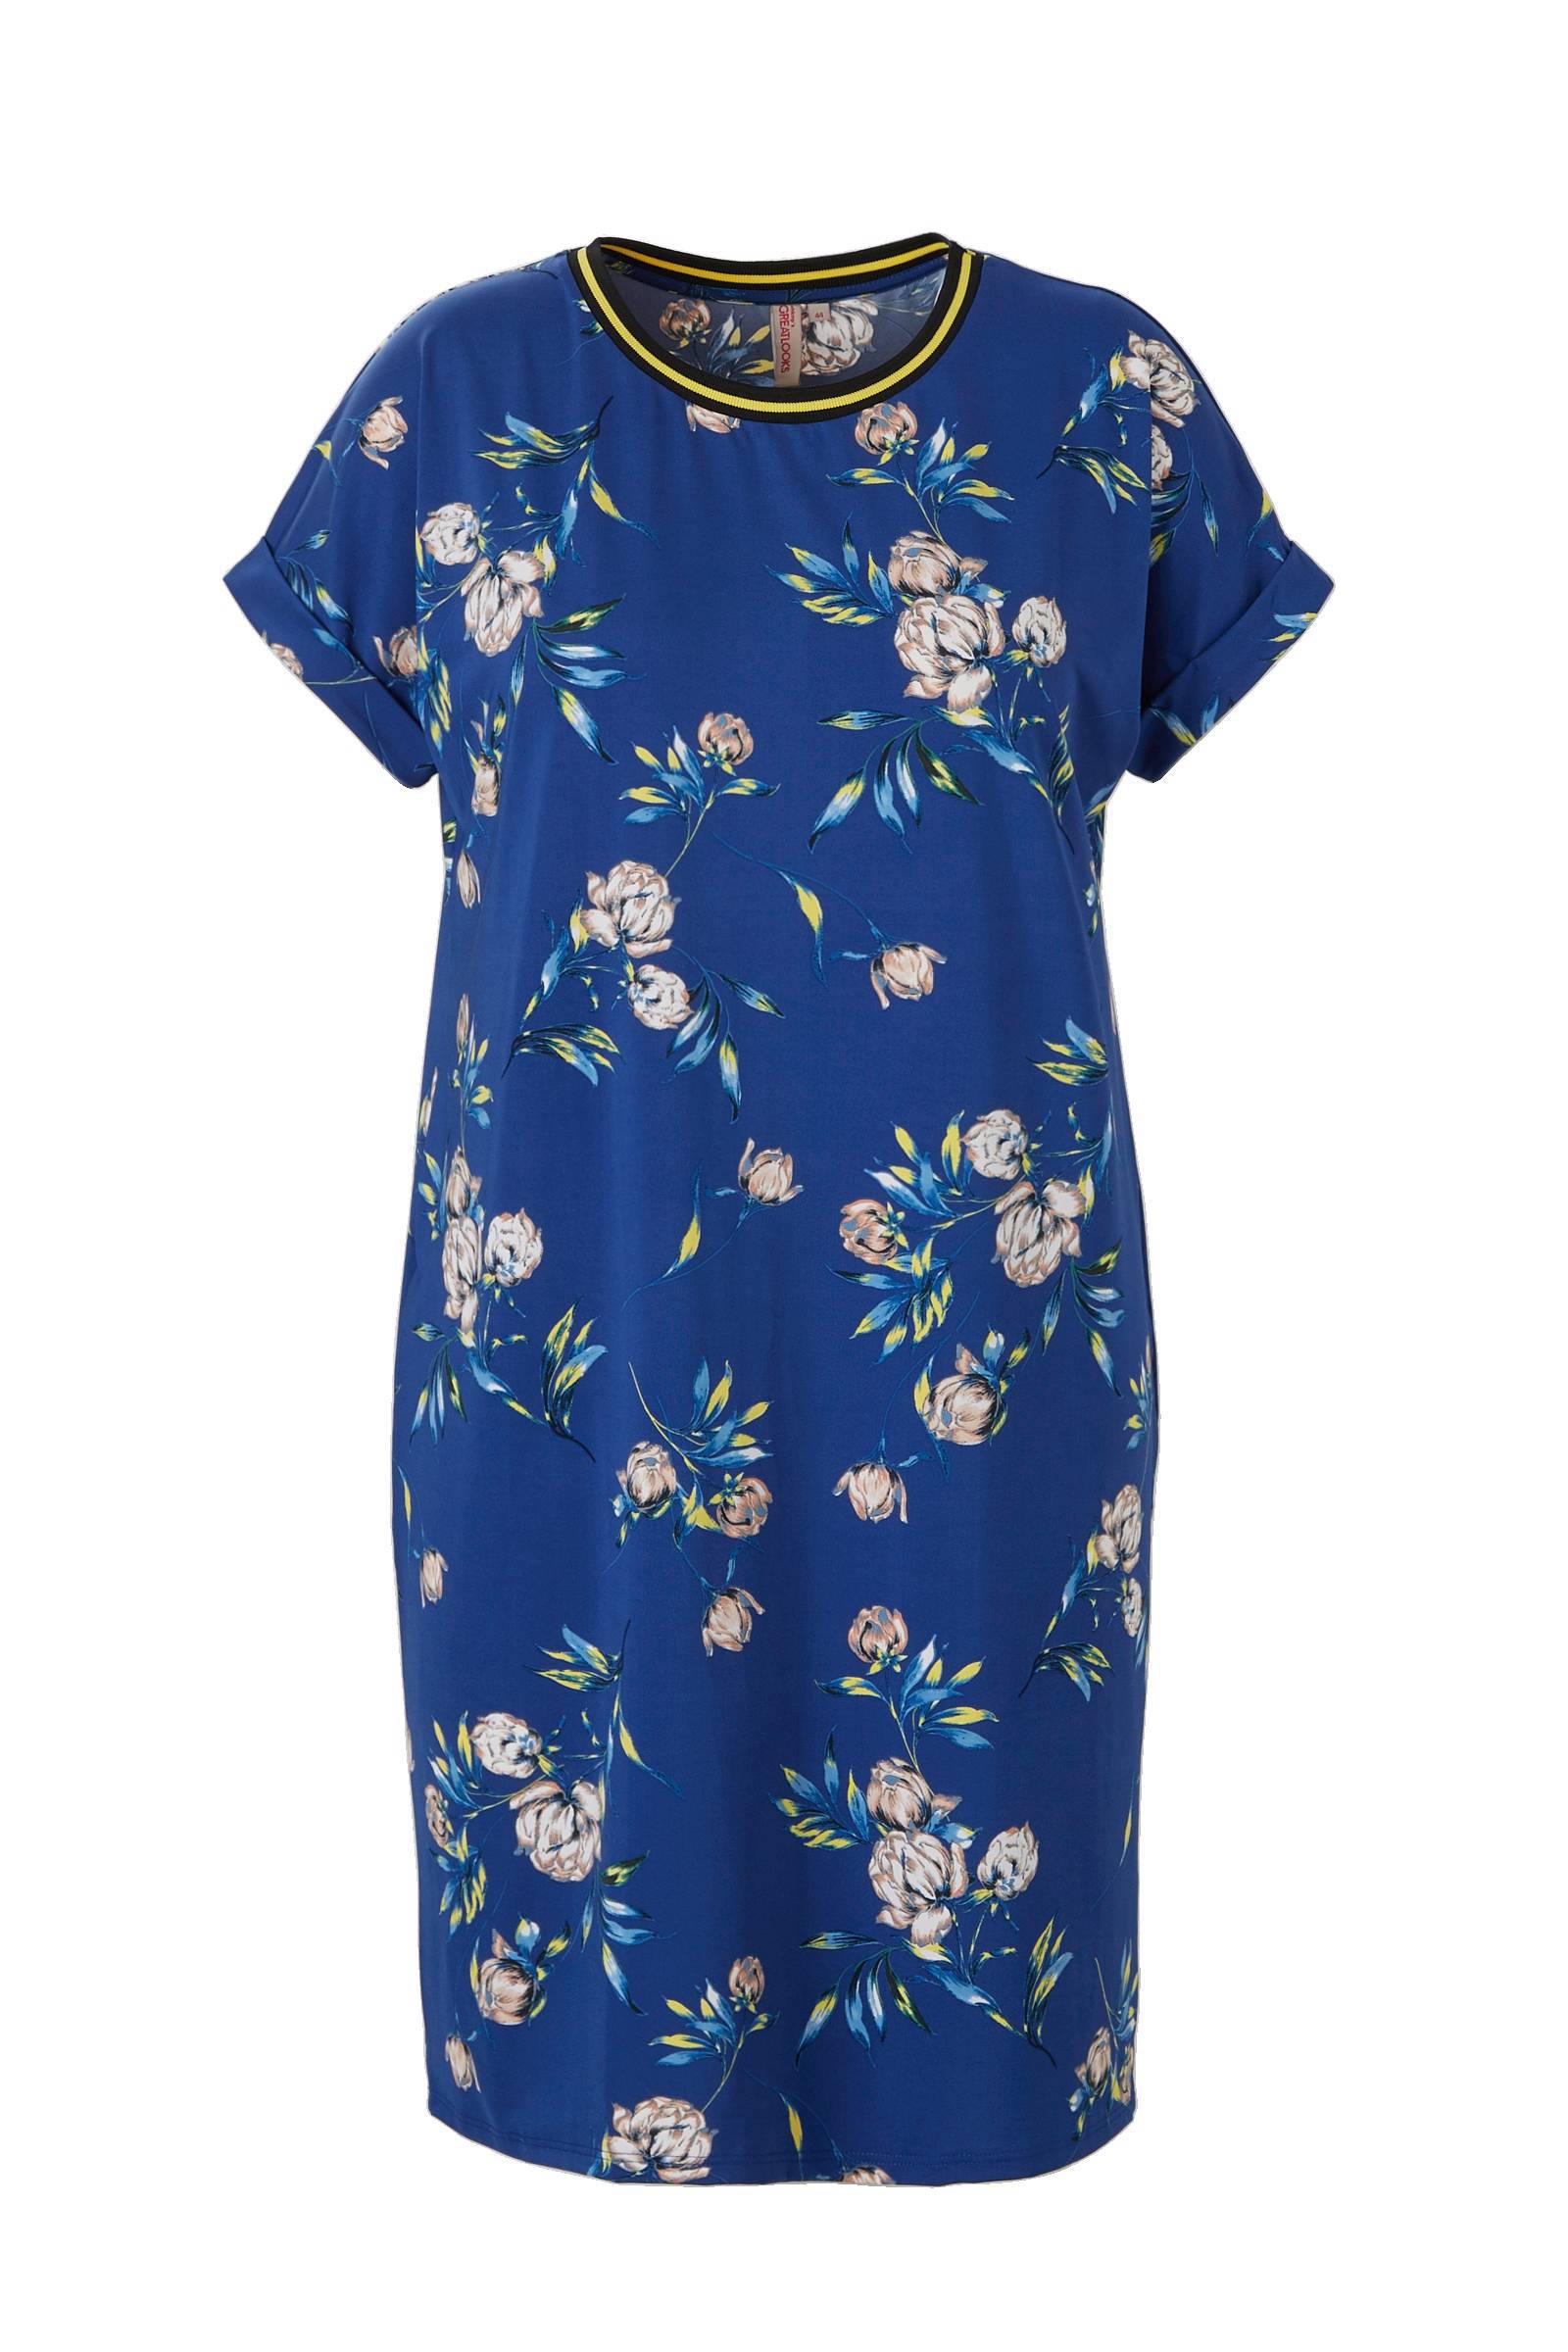 whkmp's great looks jurk met bloemenprint